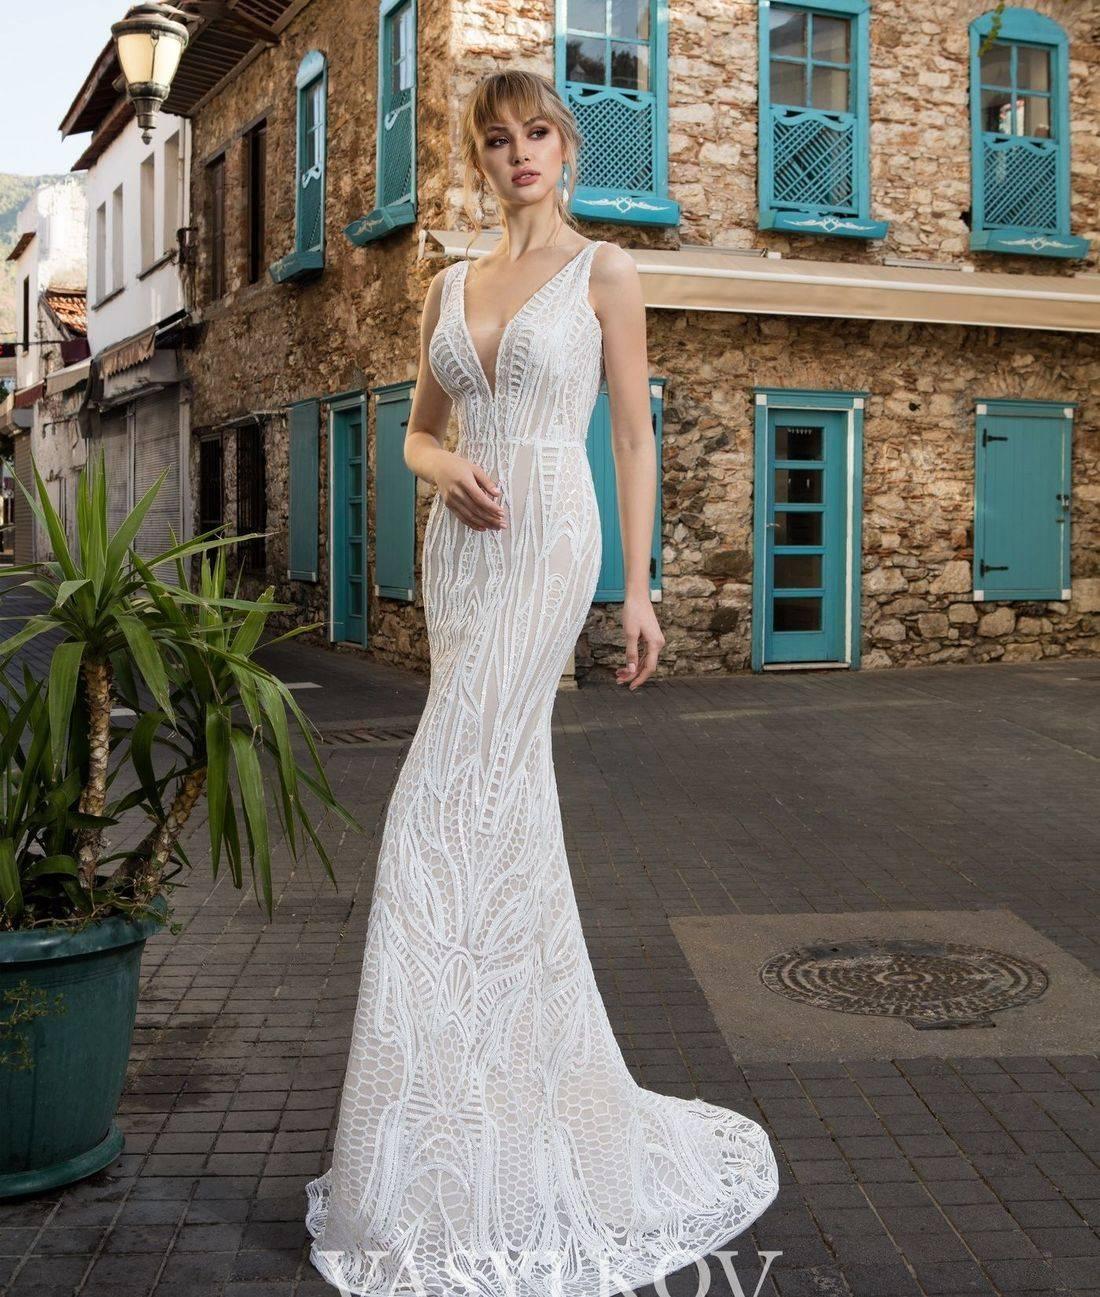 Beach wedding dress,simple wedding dress,modest wedding dress,wedding dresses